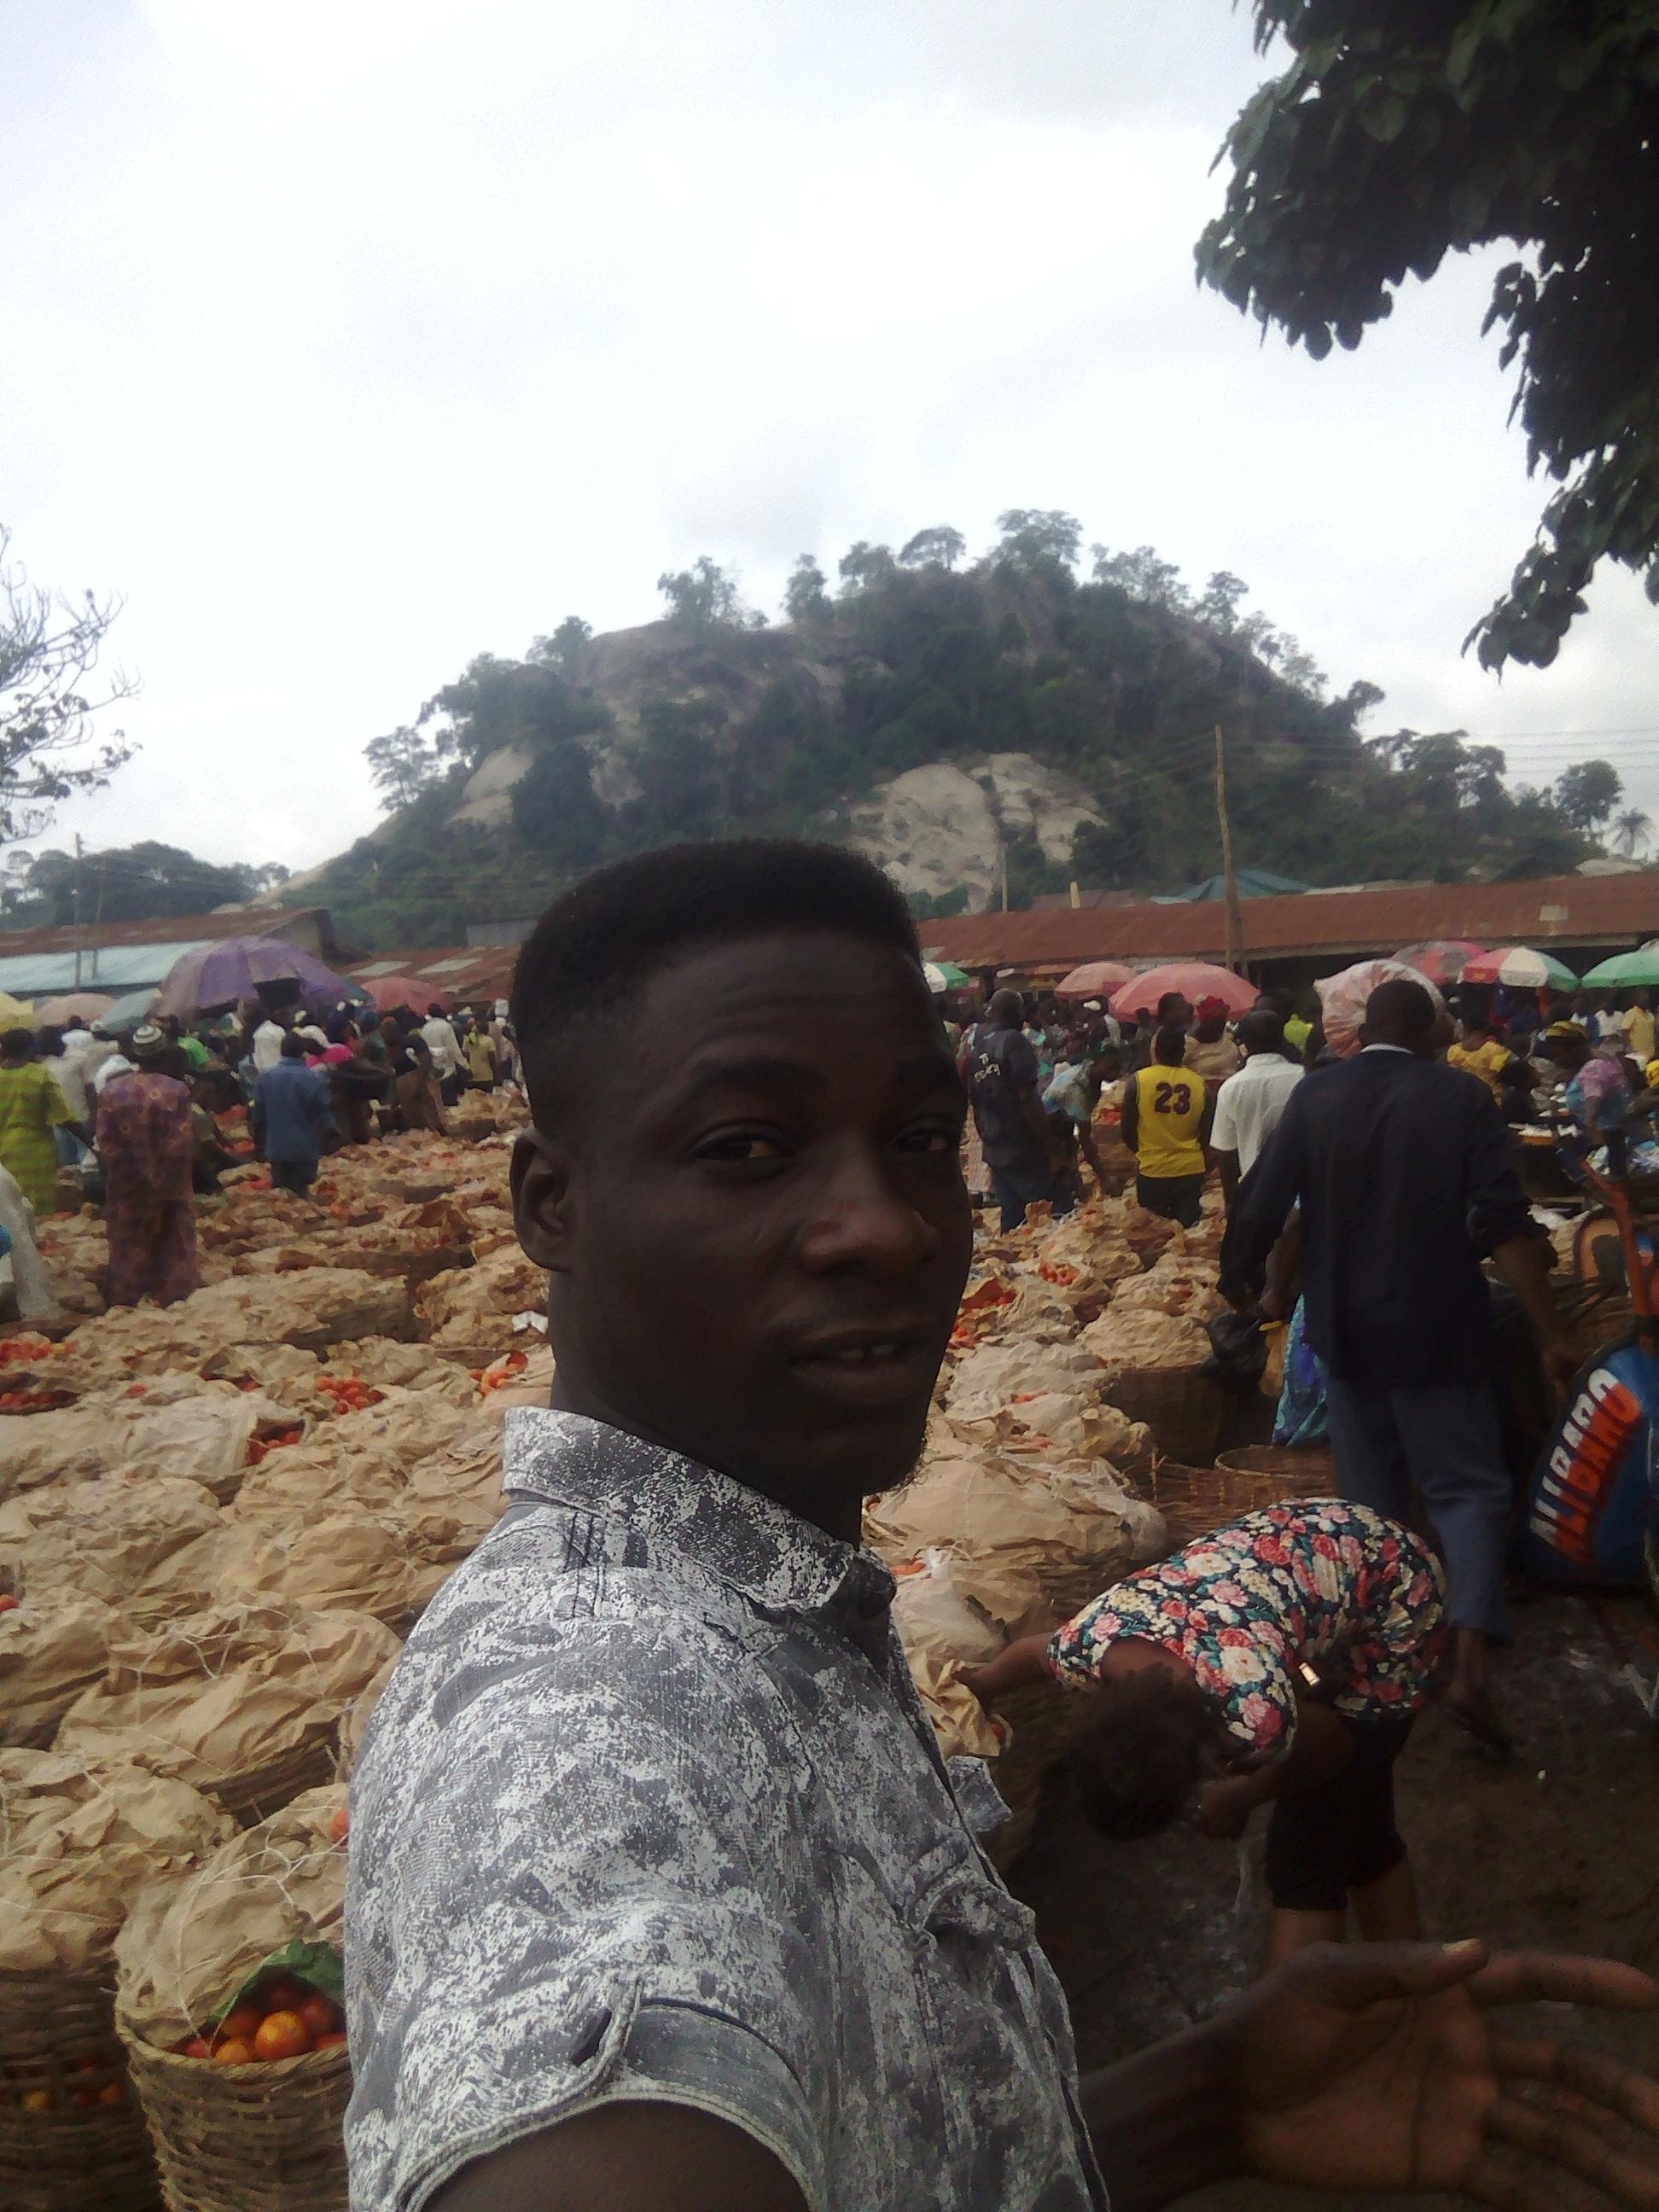 /srv/www/vhosts/user3101/html/entrepreneurship-campus.org/wp-content/uploads/2019/04/@-Shasha-Akure-1.jpg